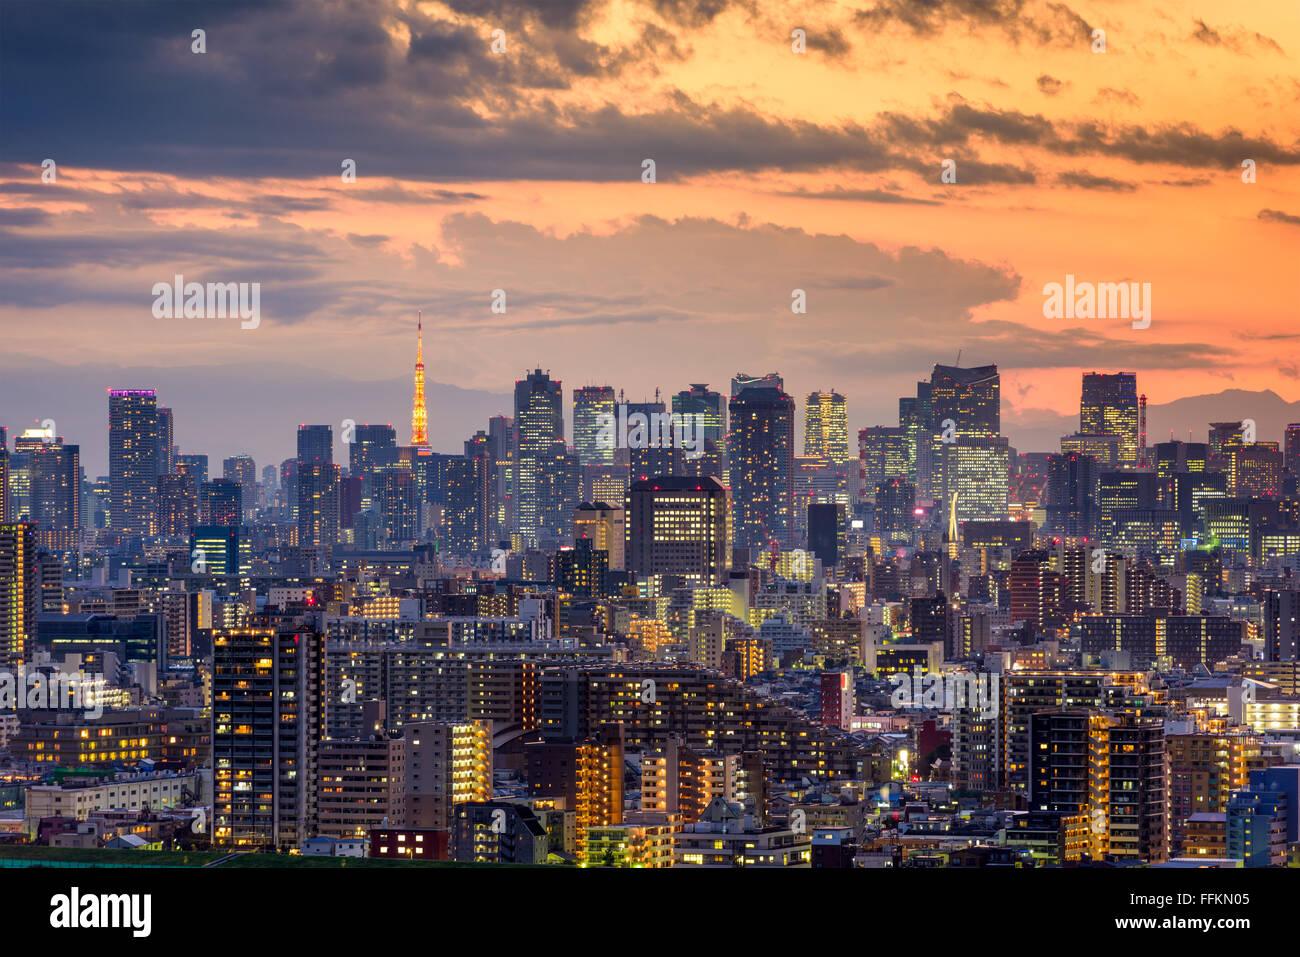 Tokyo, Japan Stadt Skyline in der Abenddämmerung. Stockbild